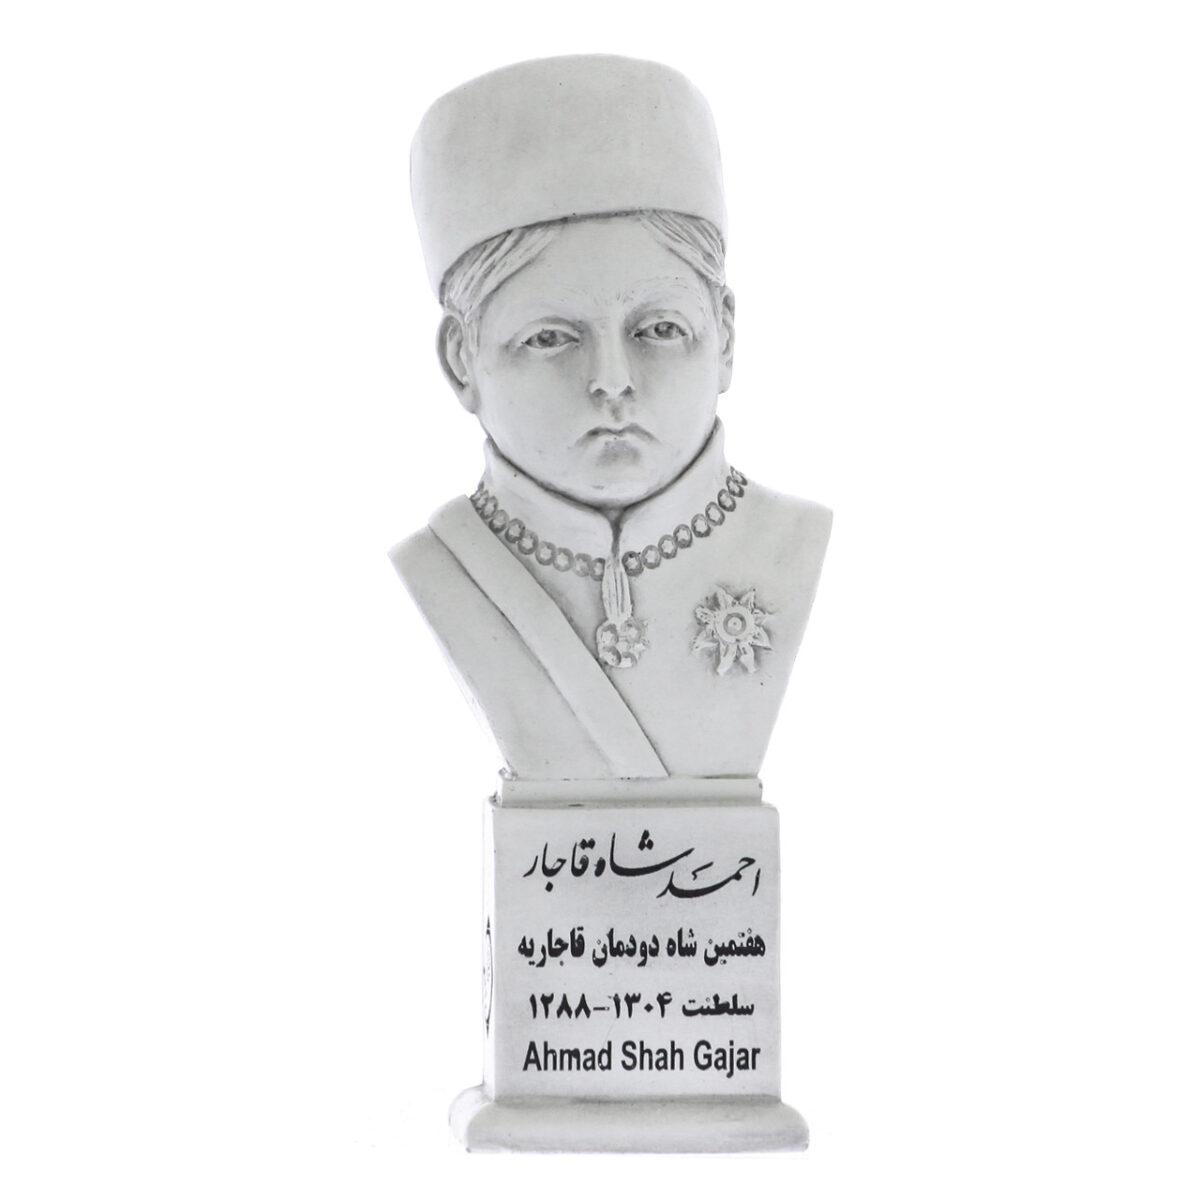 ahmad shah s 1200x1200 - سردیس احمد شاه قاجار